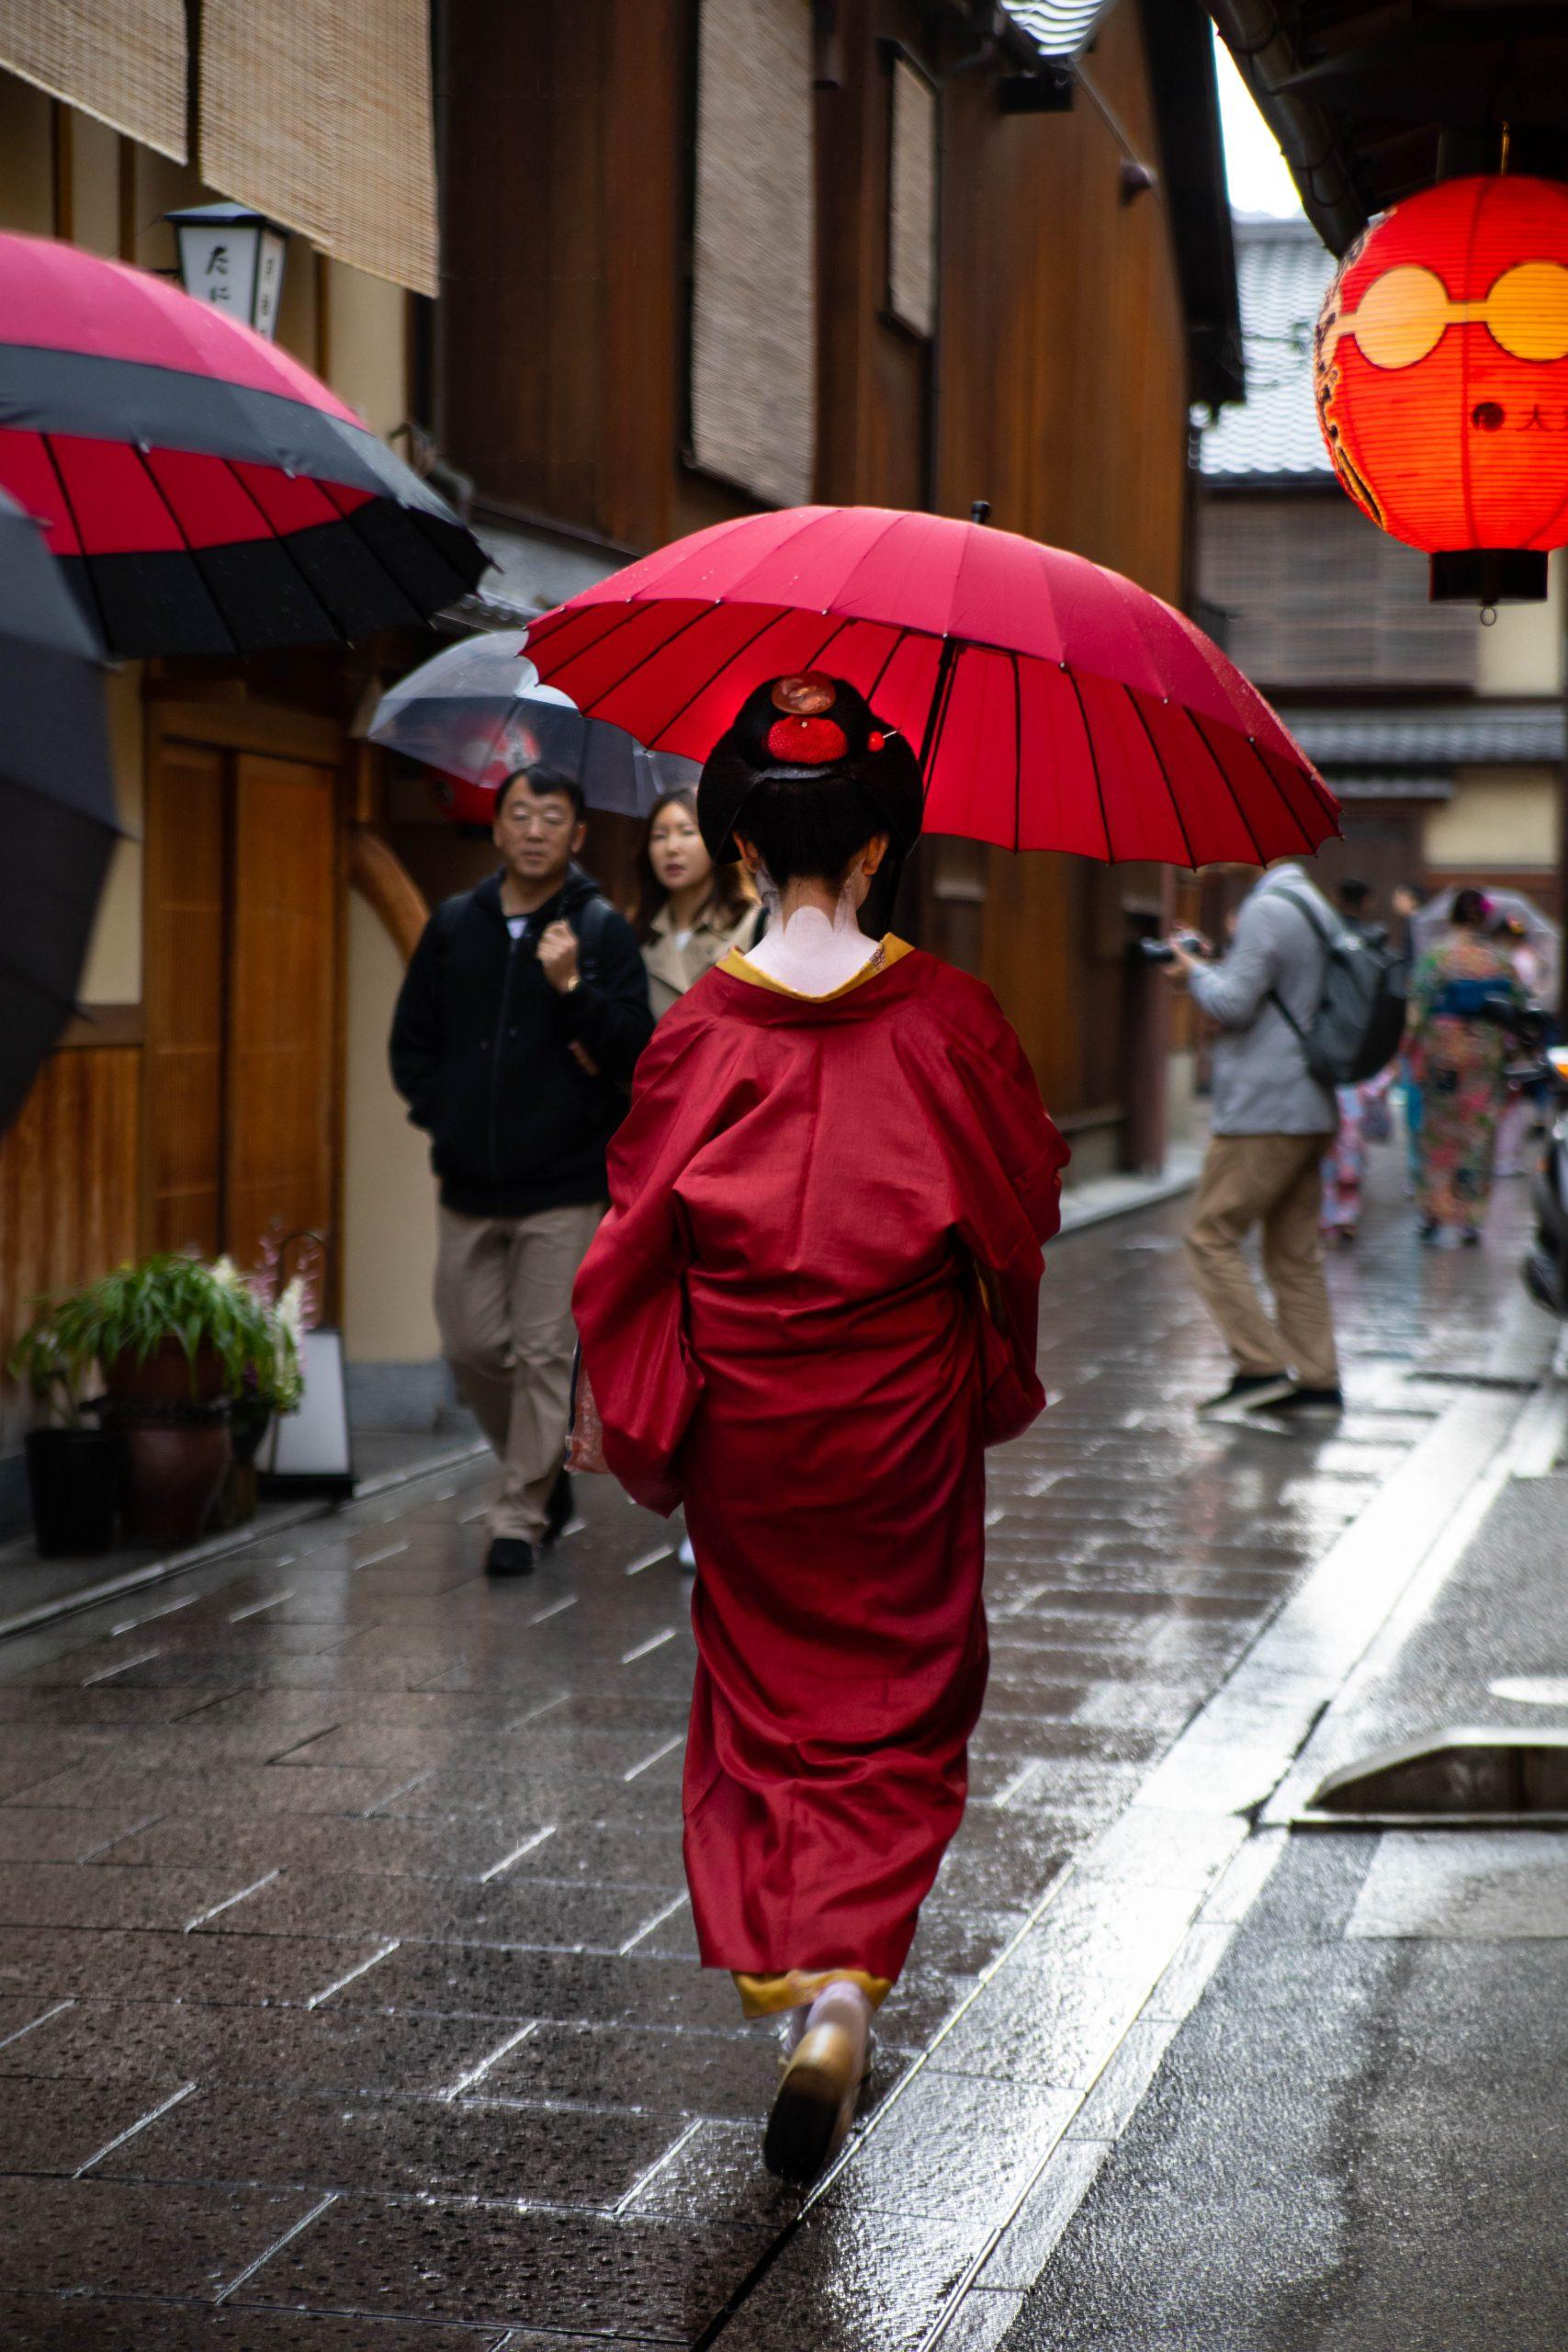 Geisha Maiko Apprentice Walking to Work in Kimono in Gion, Kyoto, Japan